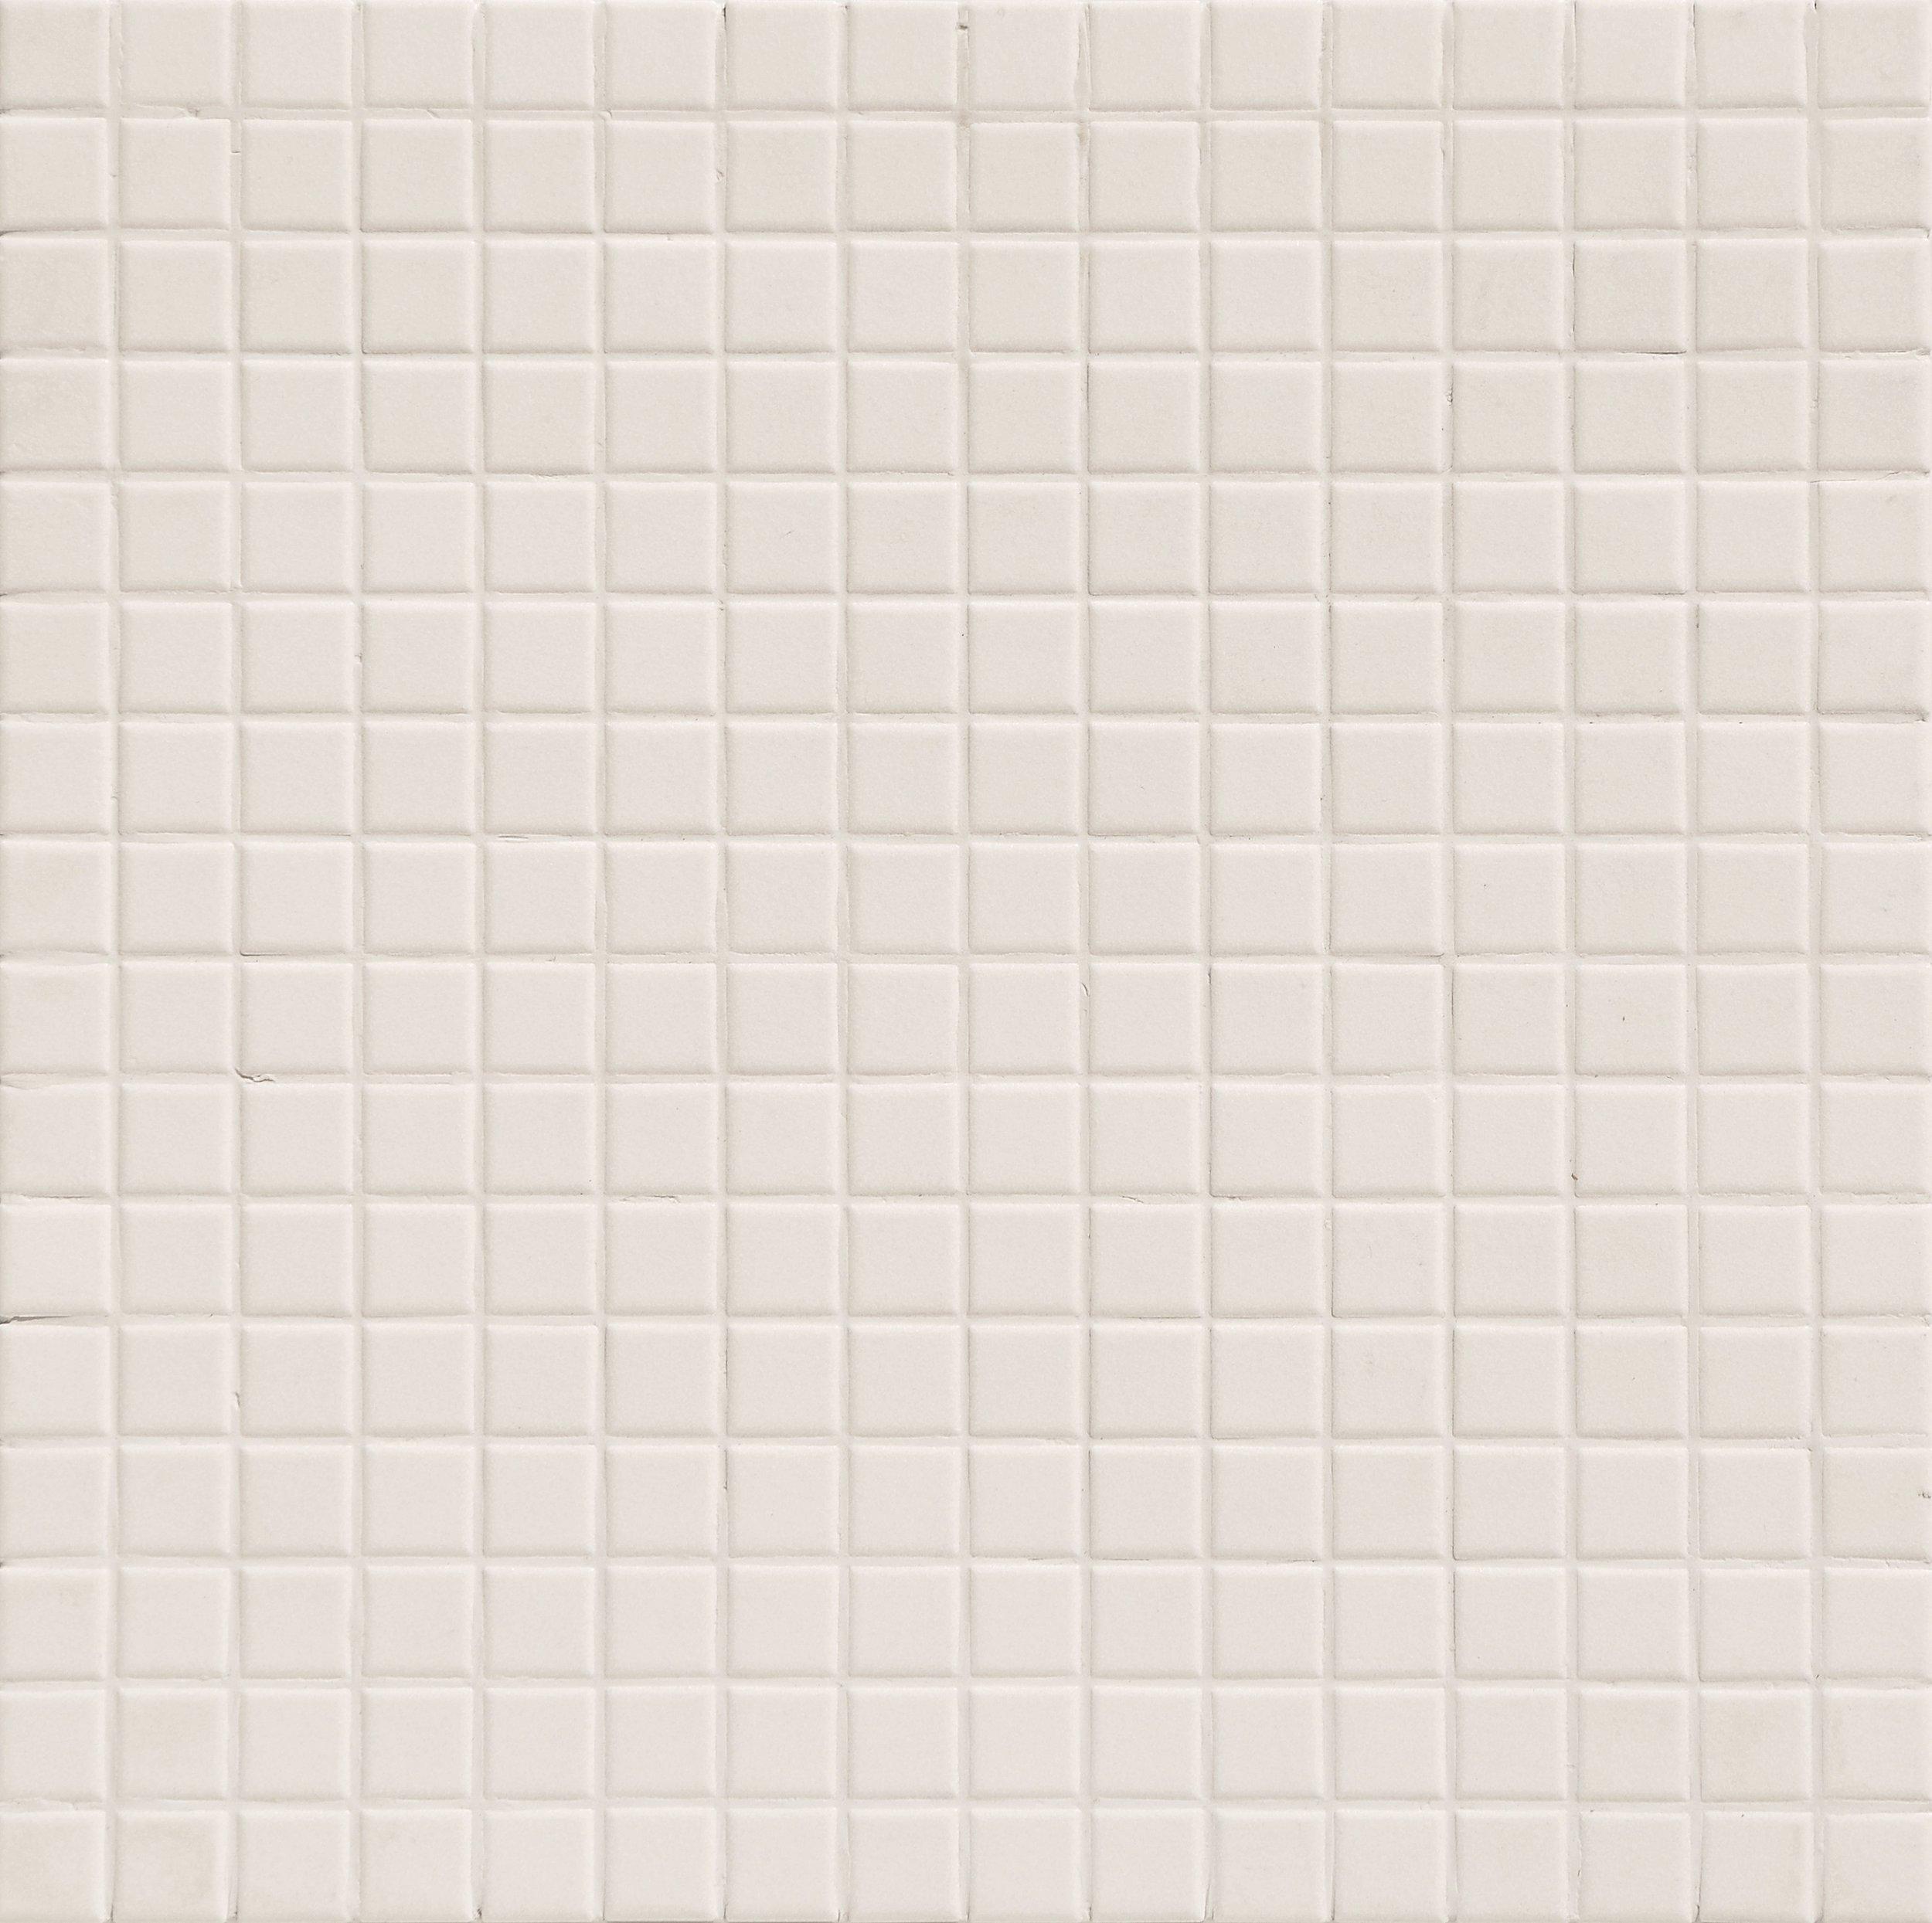 Mosaico_White_FOGLIO.jpg